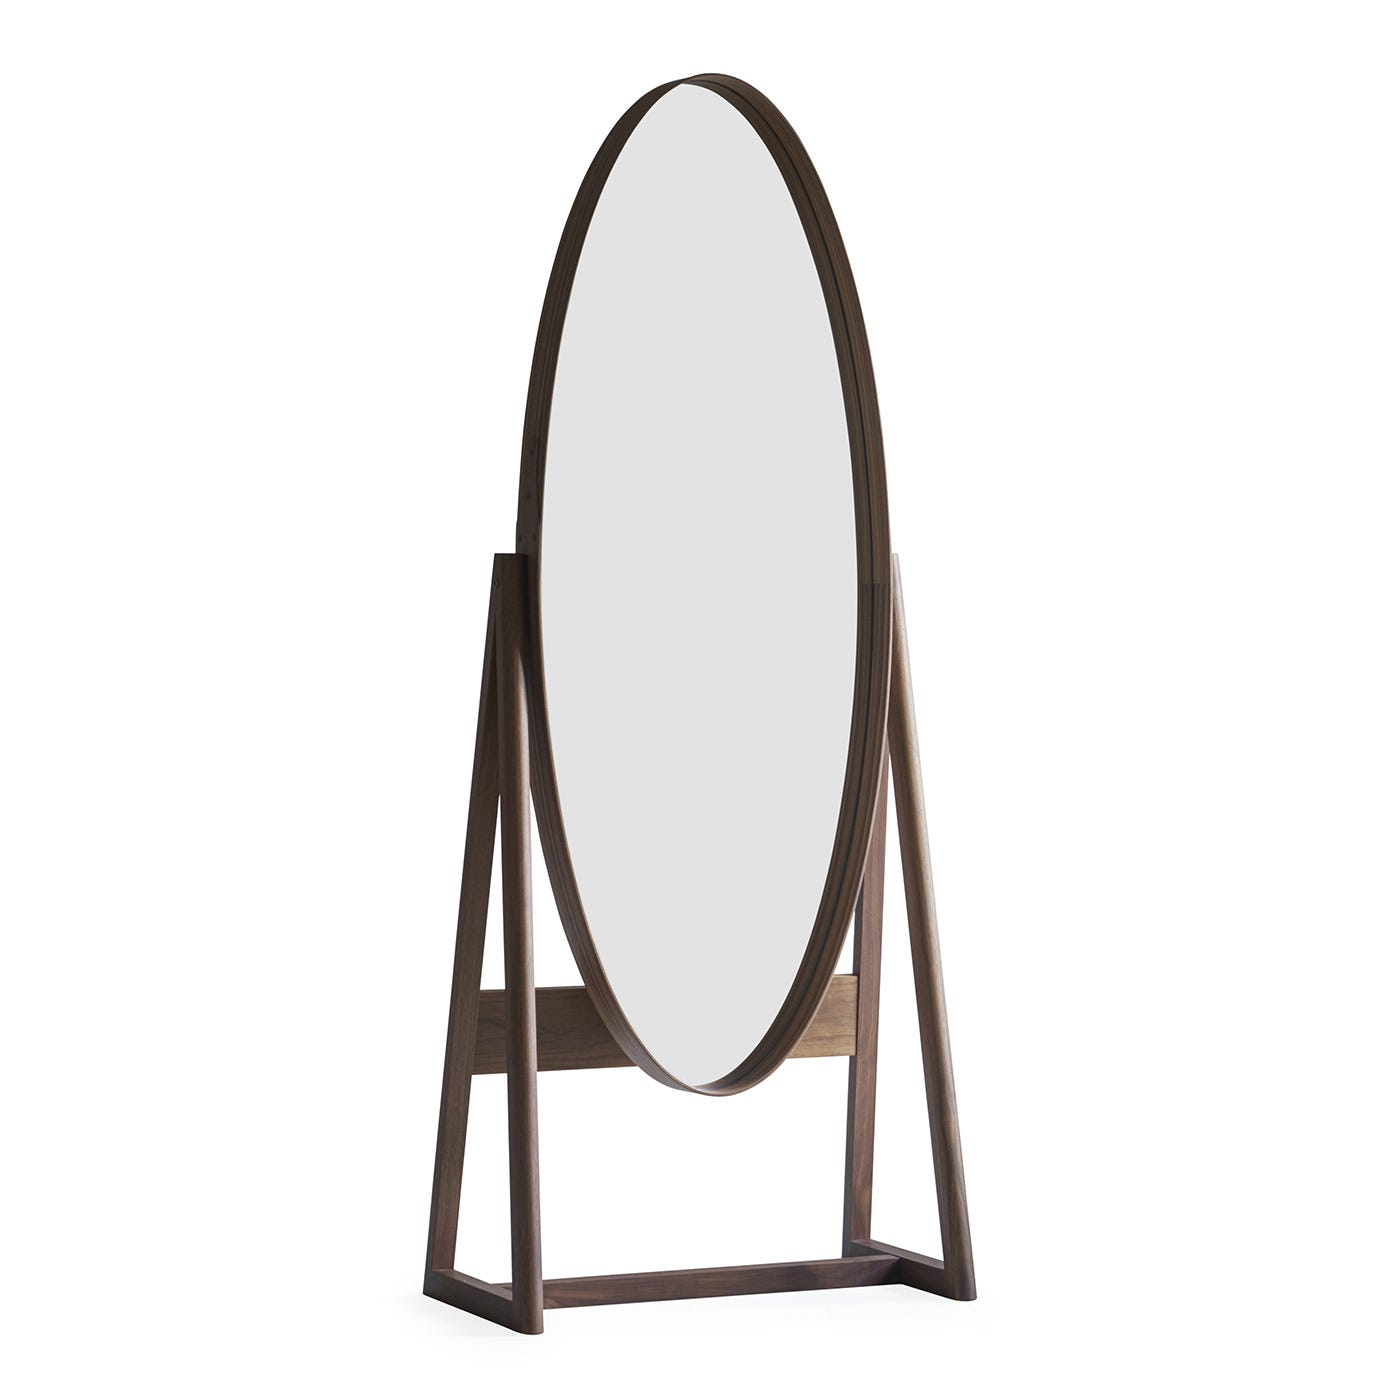 Iona Cheval Floor Mirror